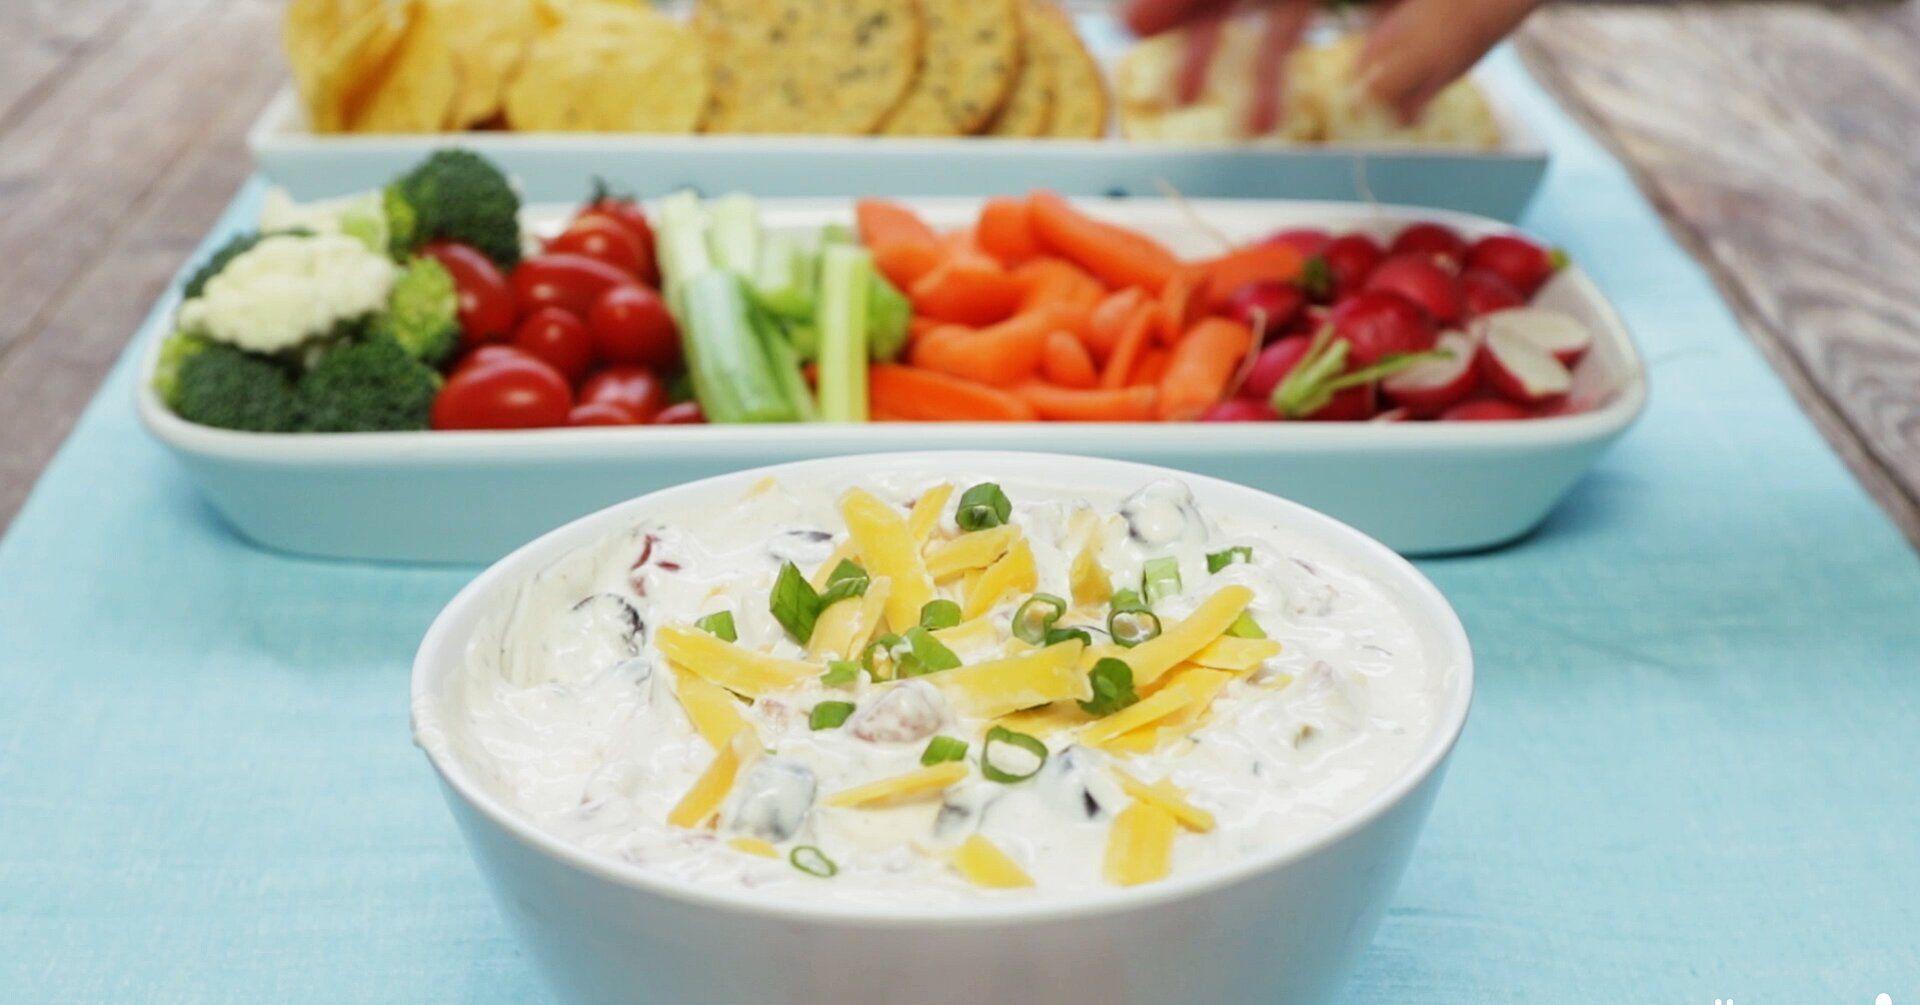 Cheesy Sour Cream And Salsa Dip Recipe In 2020 Sour Cream Dip Salsa Dip Sour Cream